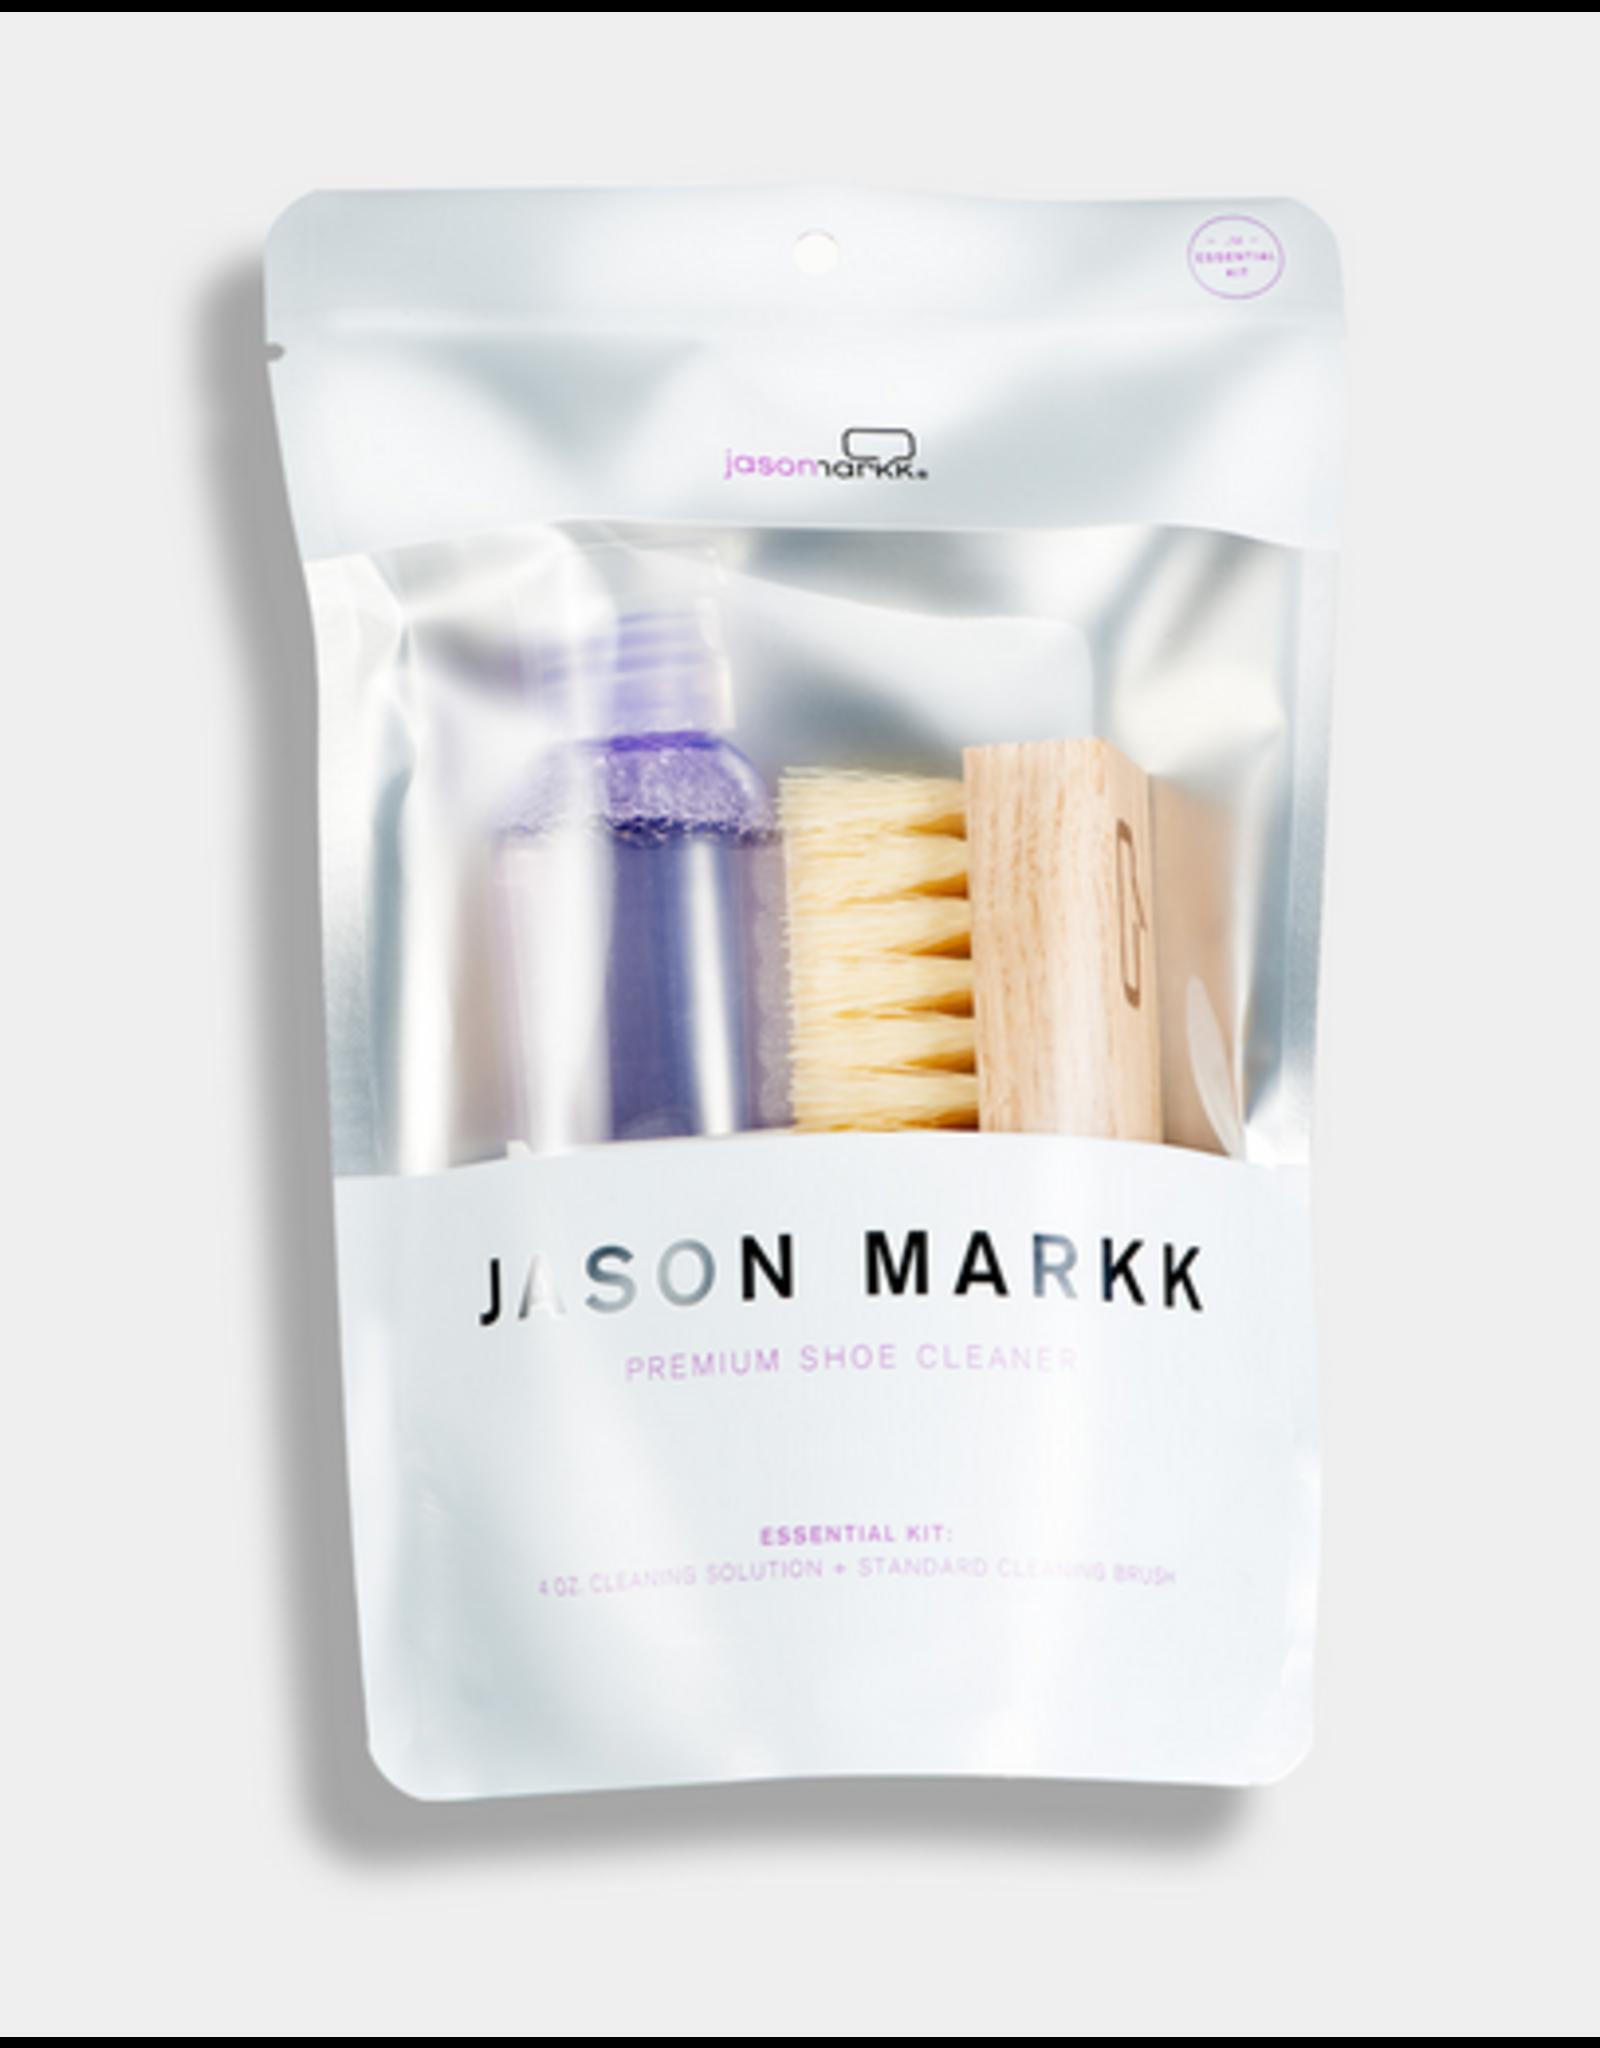 JASON MARKK Essential Kit